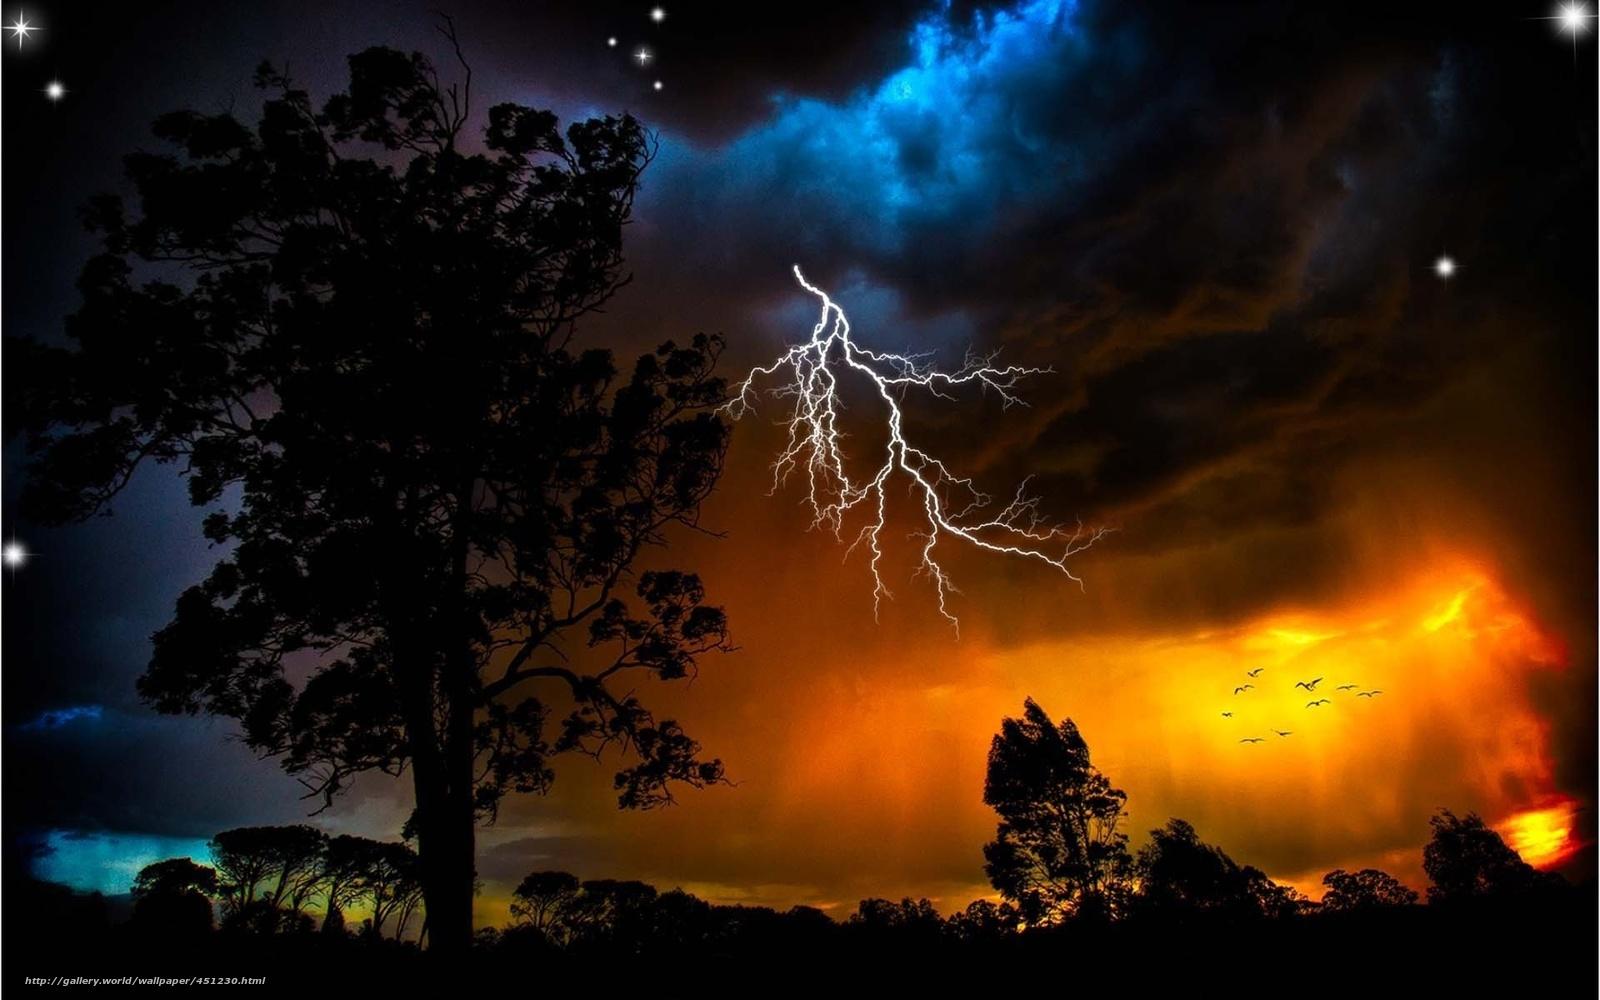 Download wallpaper storm lightning Trees desktop wallpaper in 1600x1000